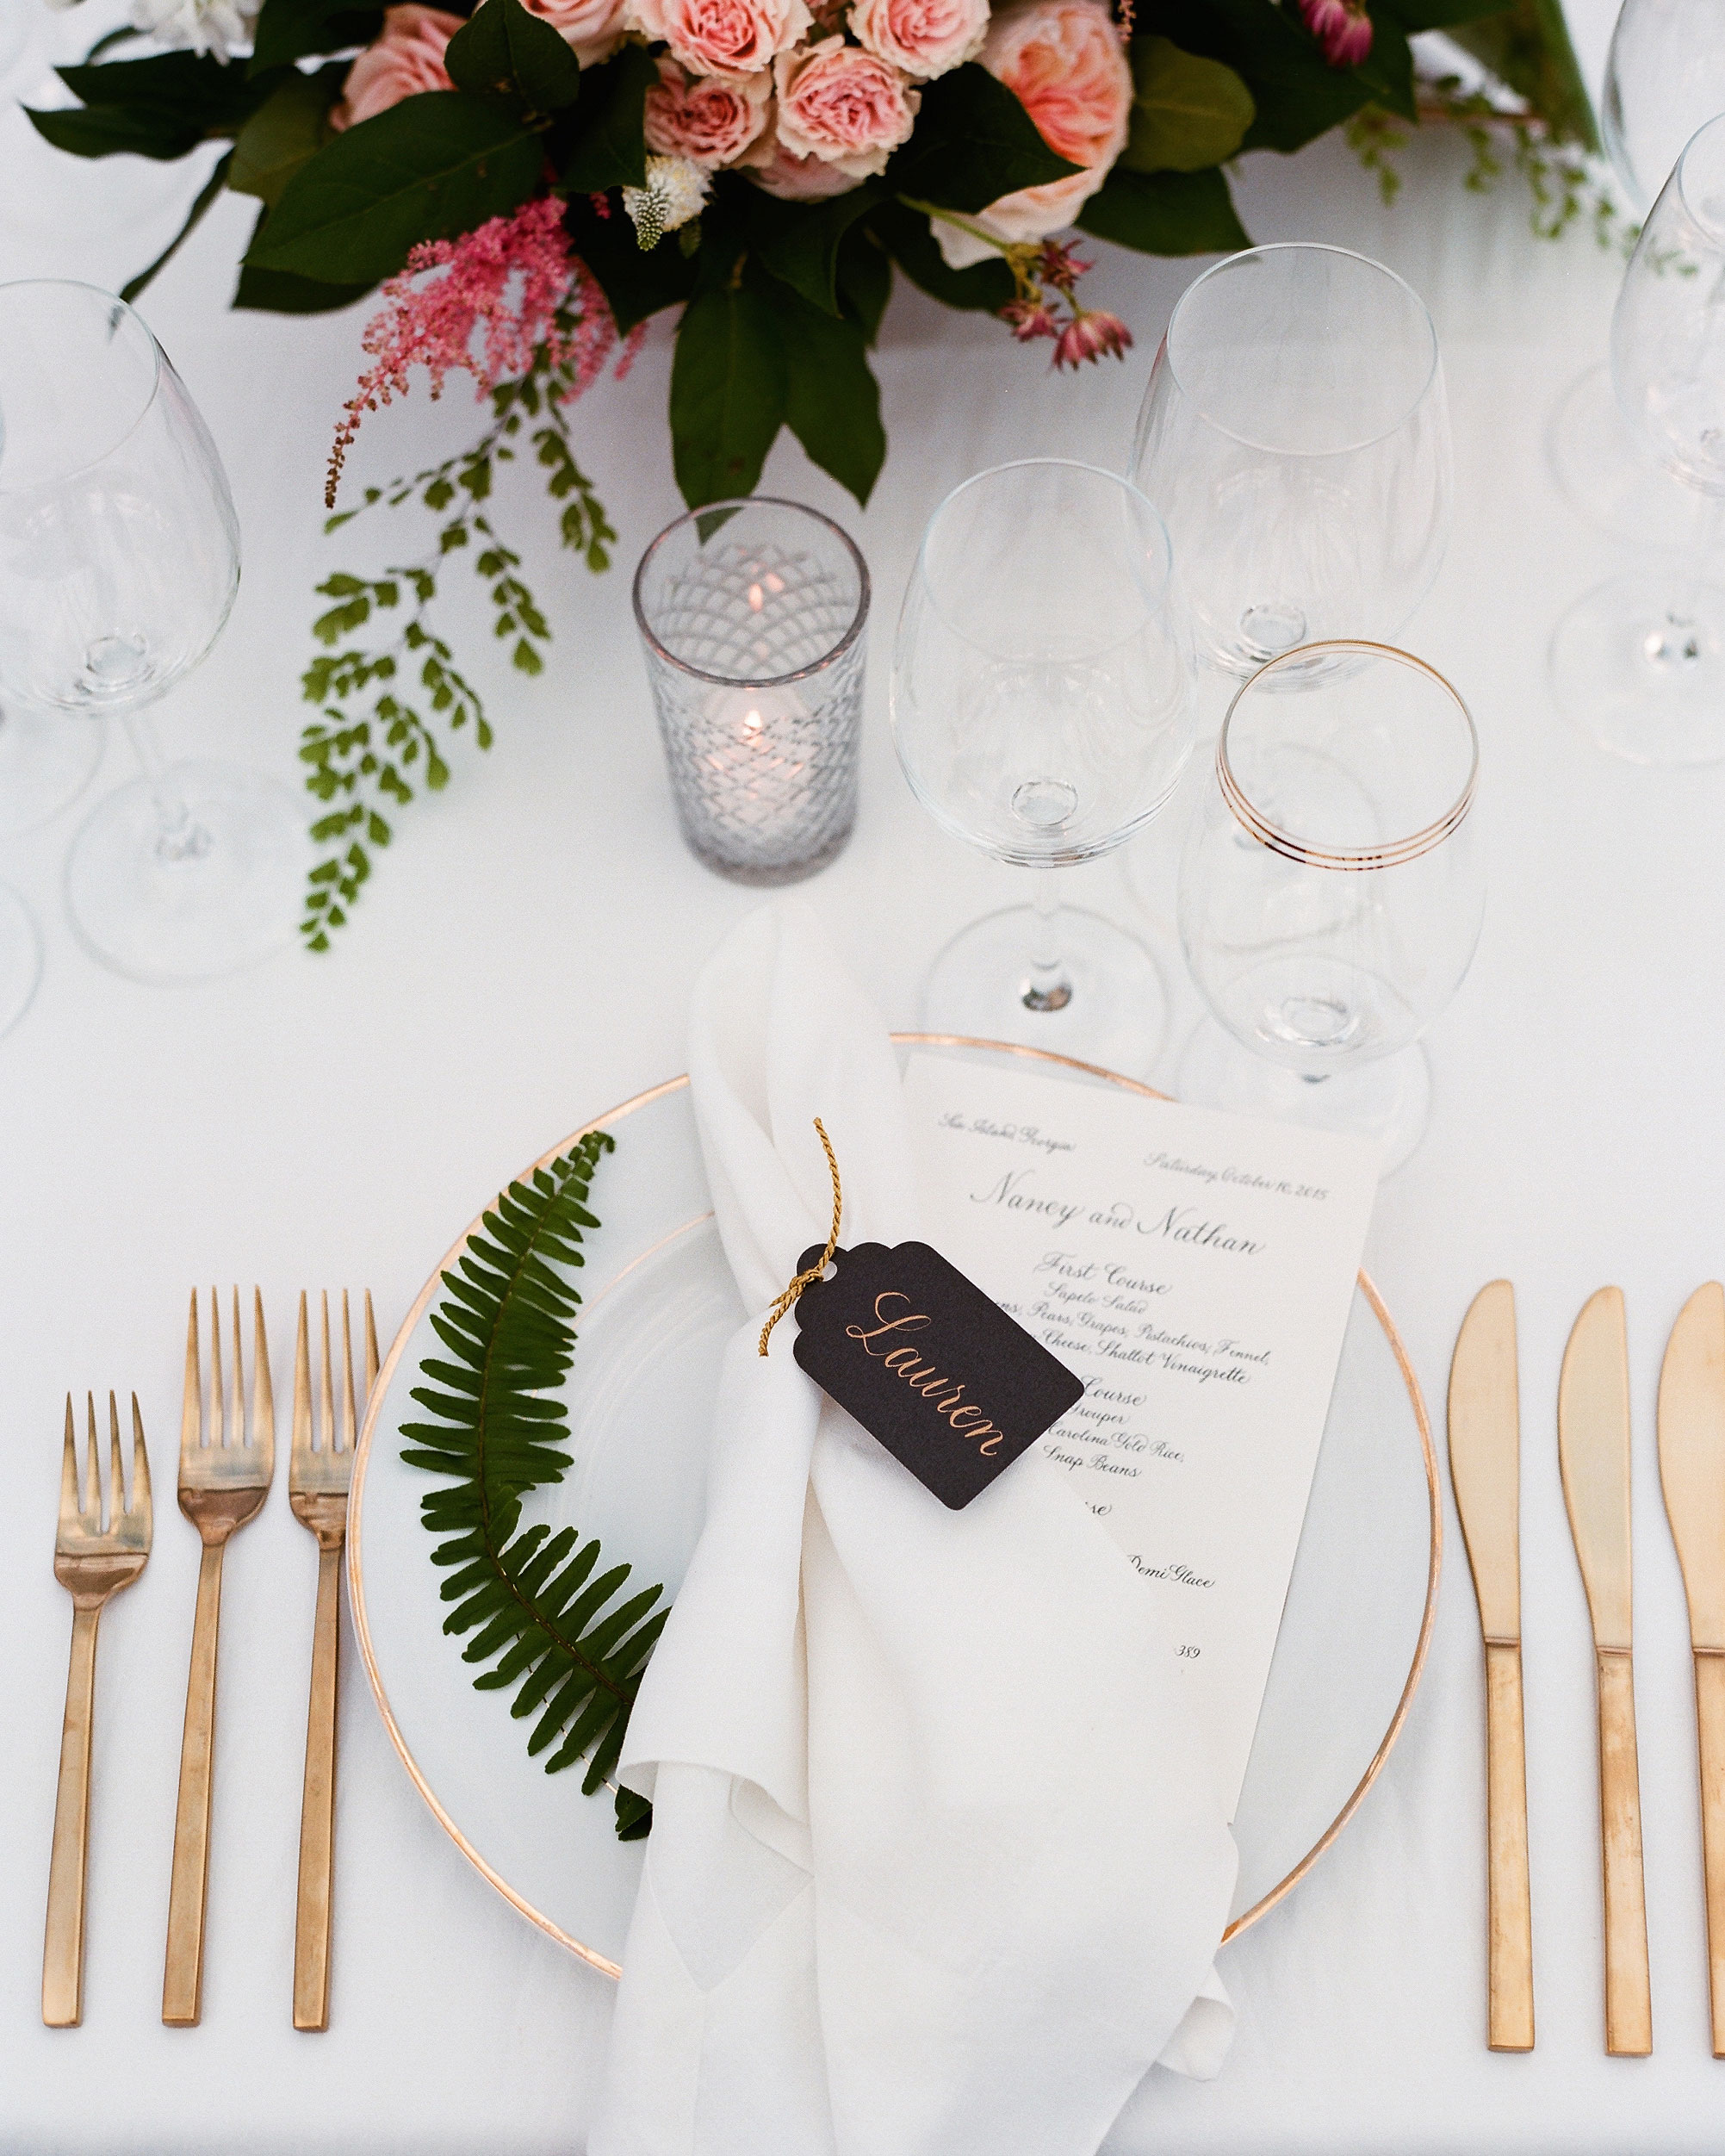 nancy-nathan-wedding-place-setting-0909-6141569-0816.jpg